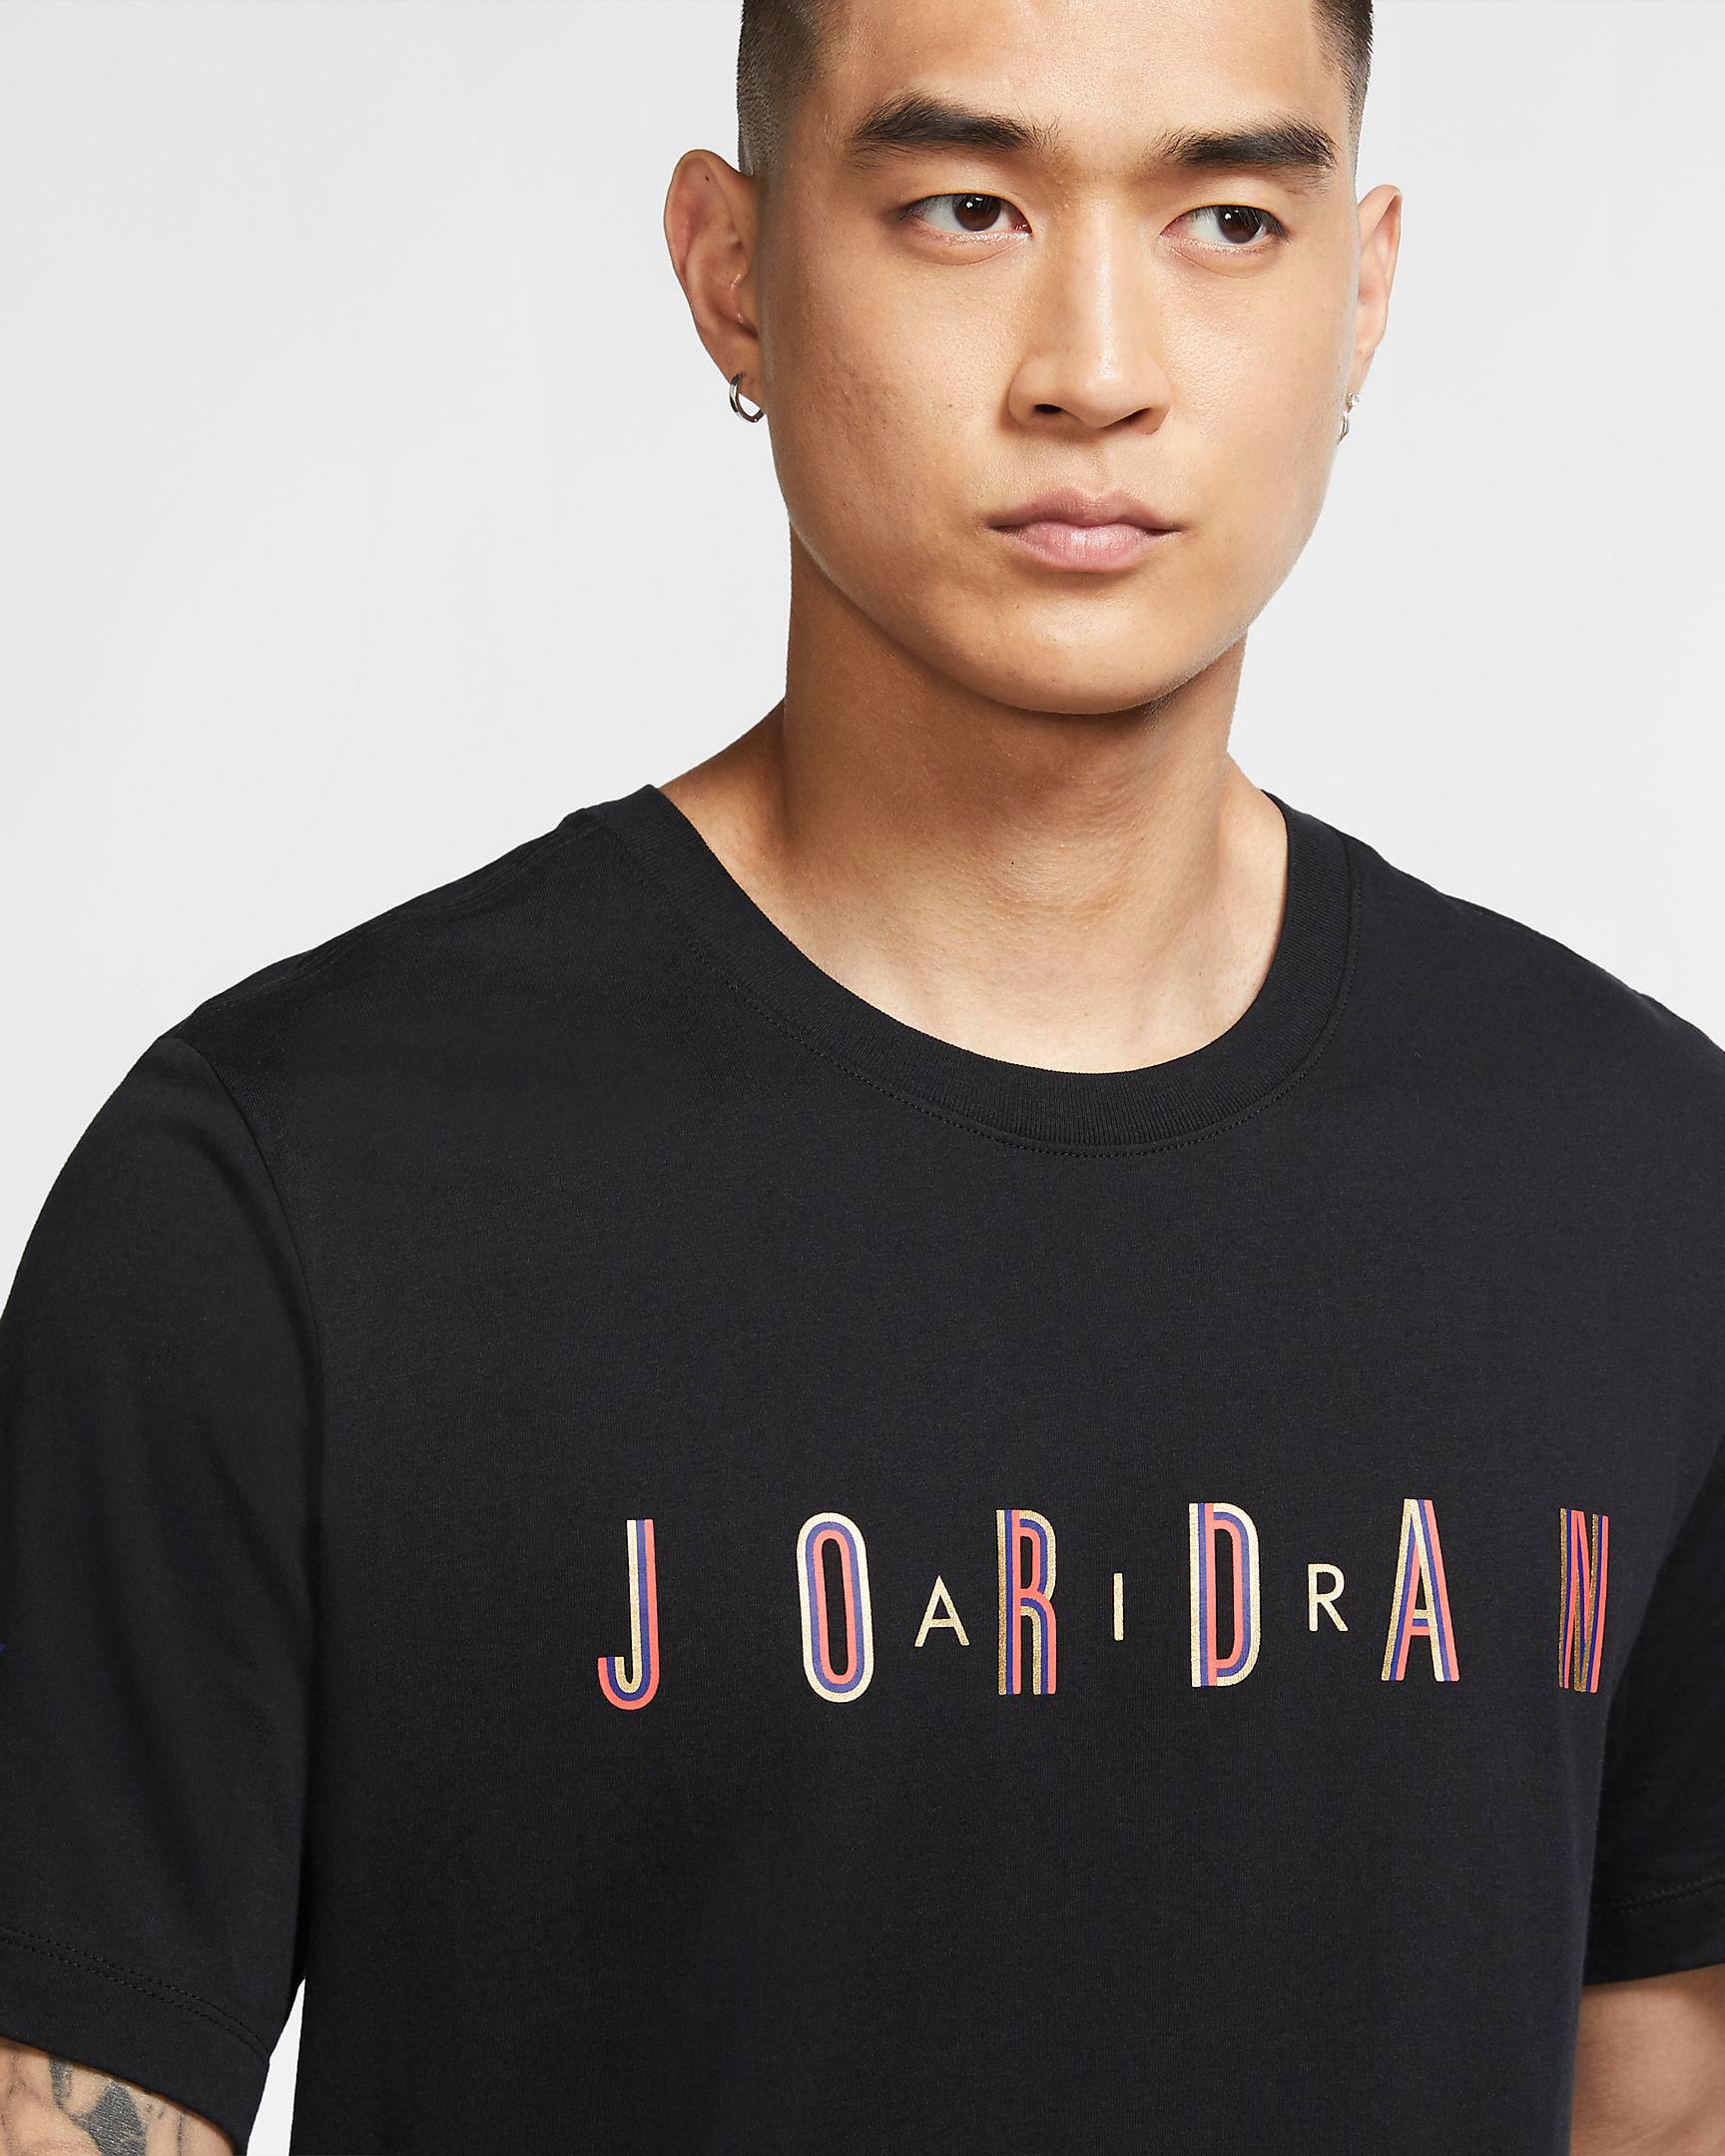 air-jordan-1-low-sweater-nothing-but-net-shirt-match-1